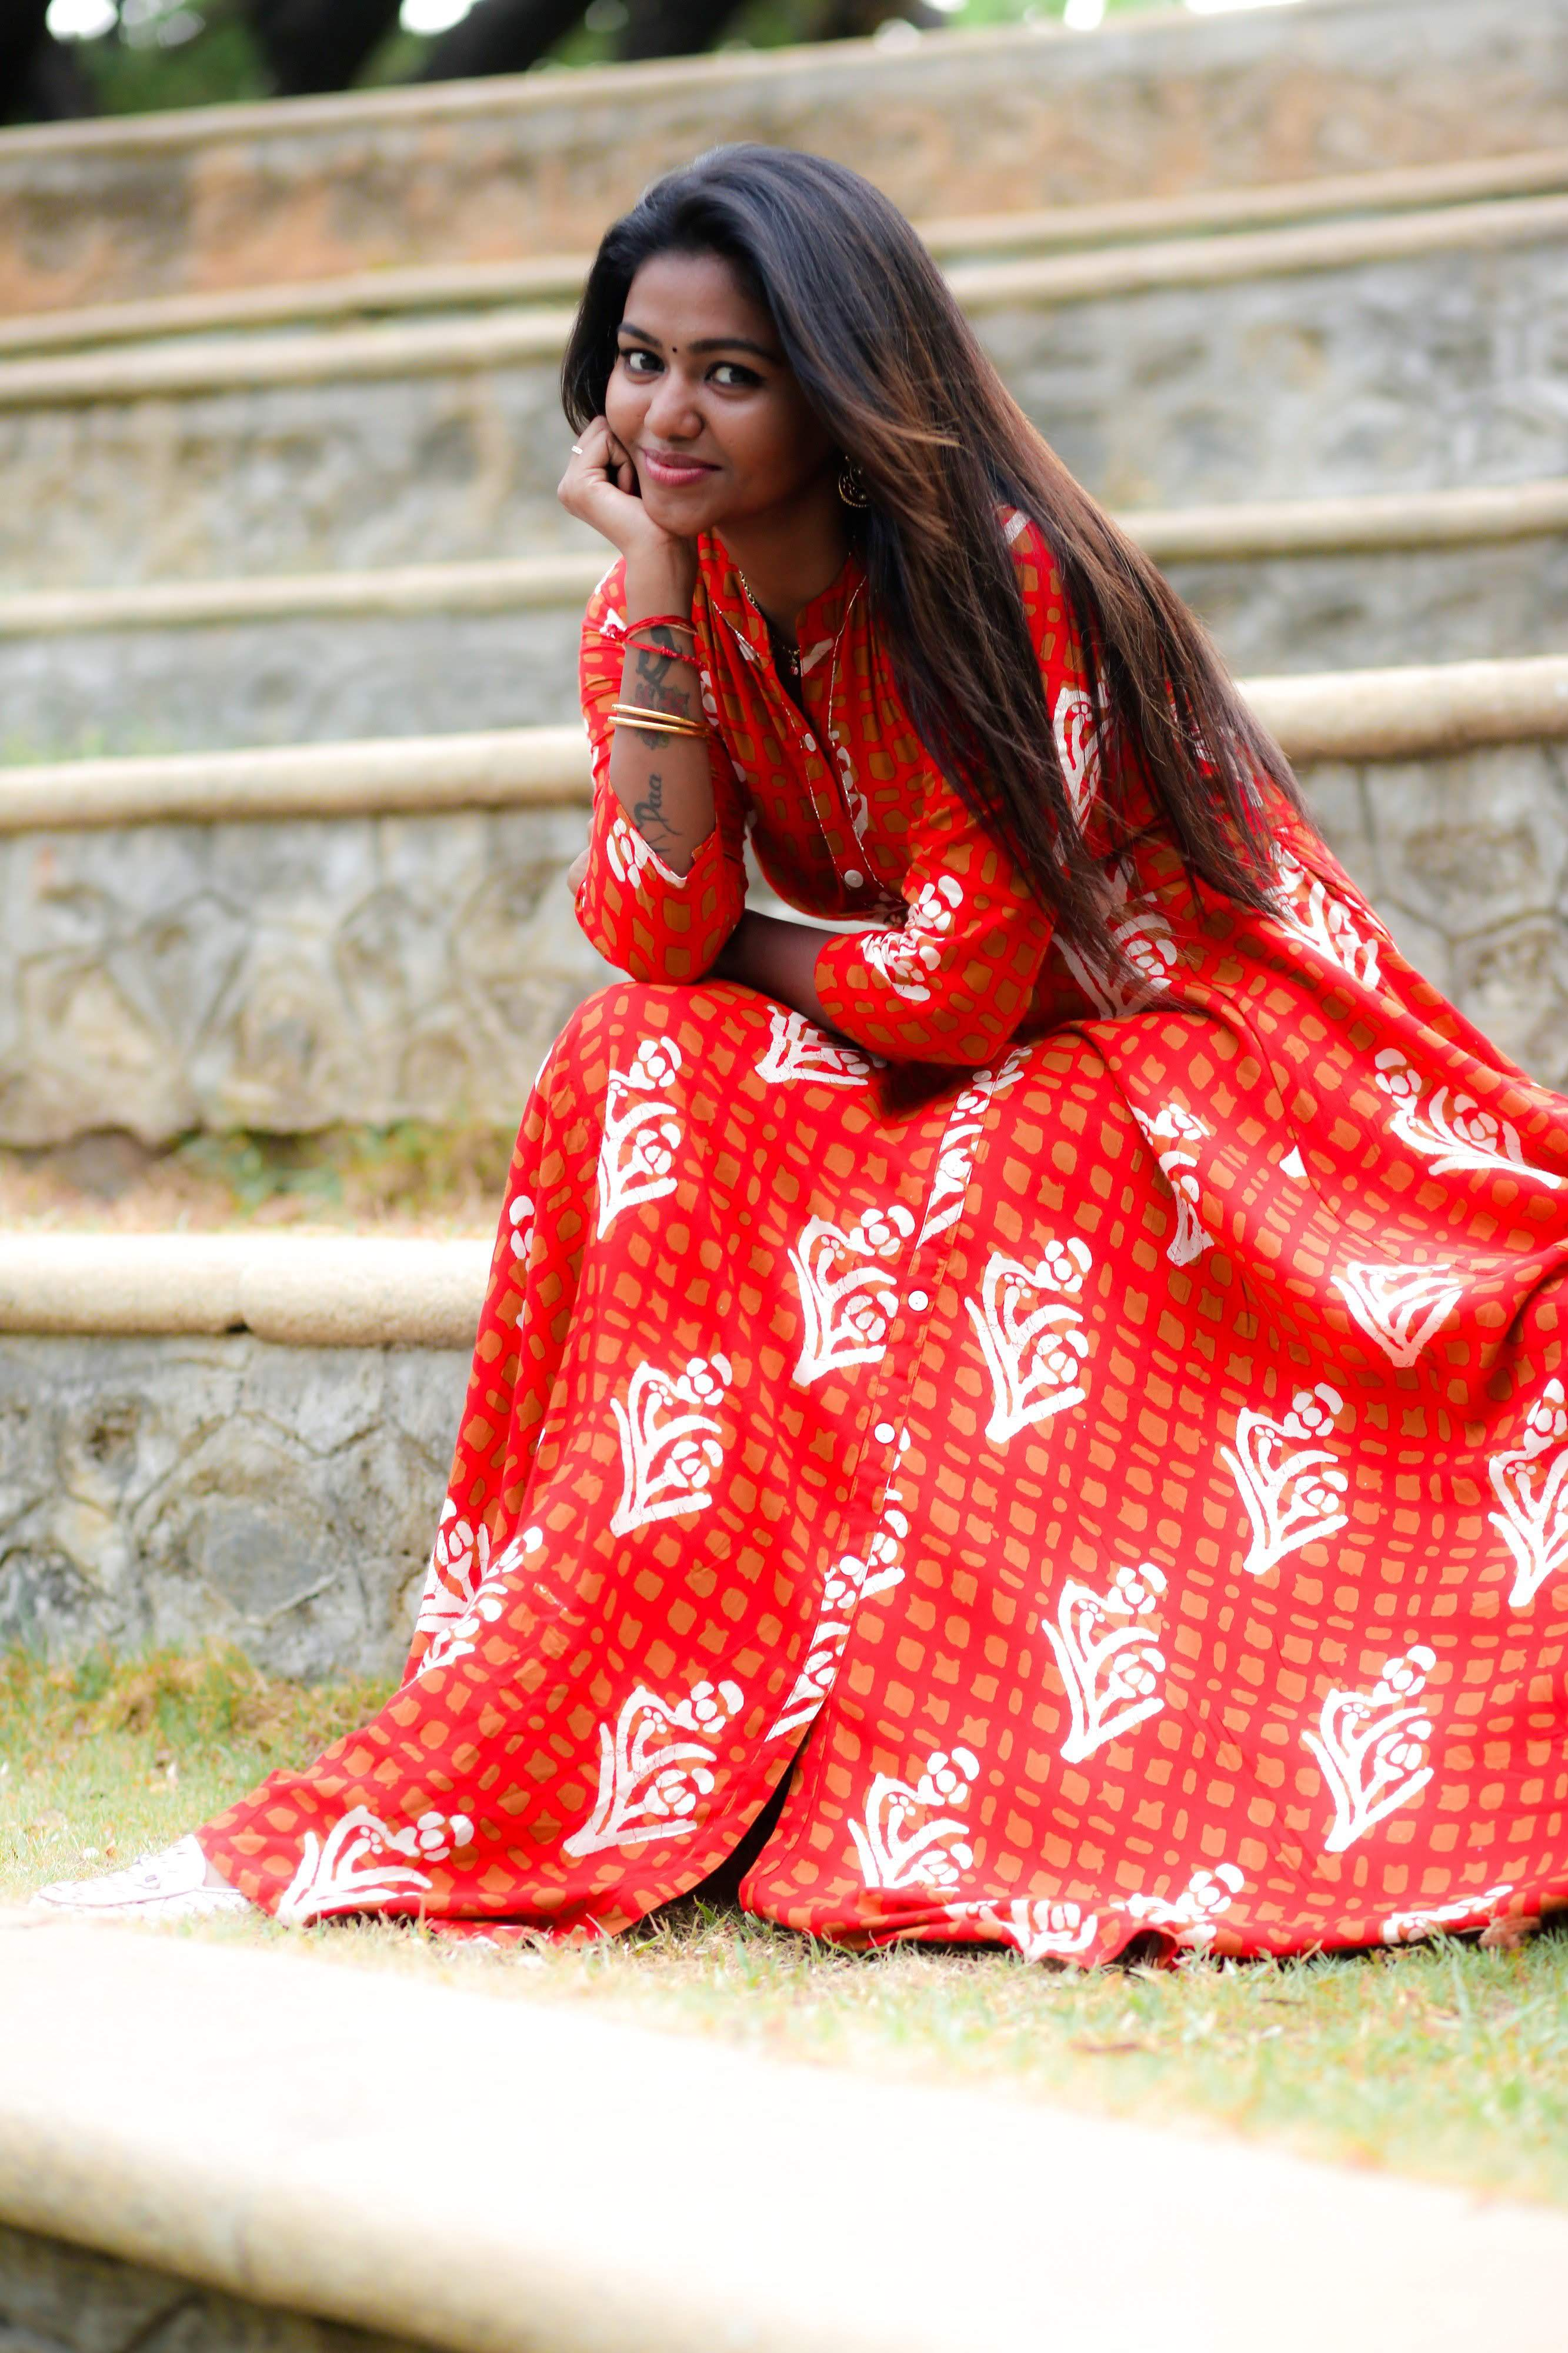 Shalu-Shammu-images-5456750